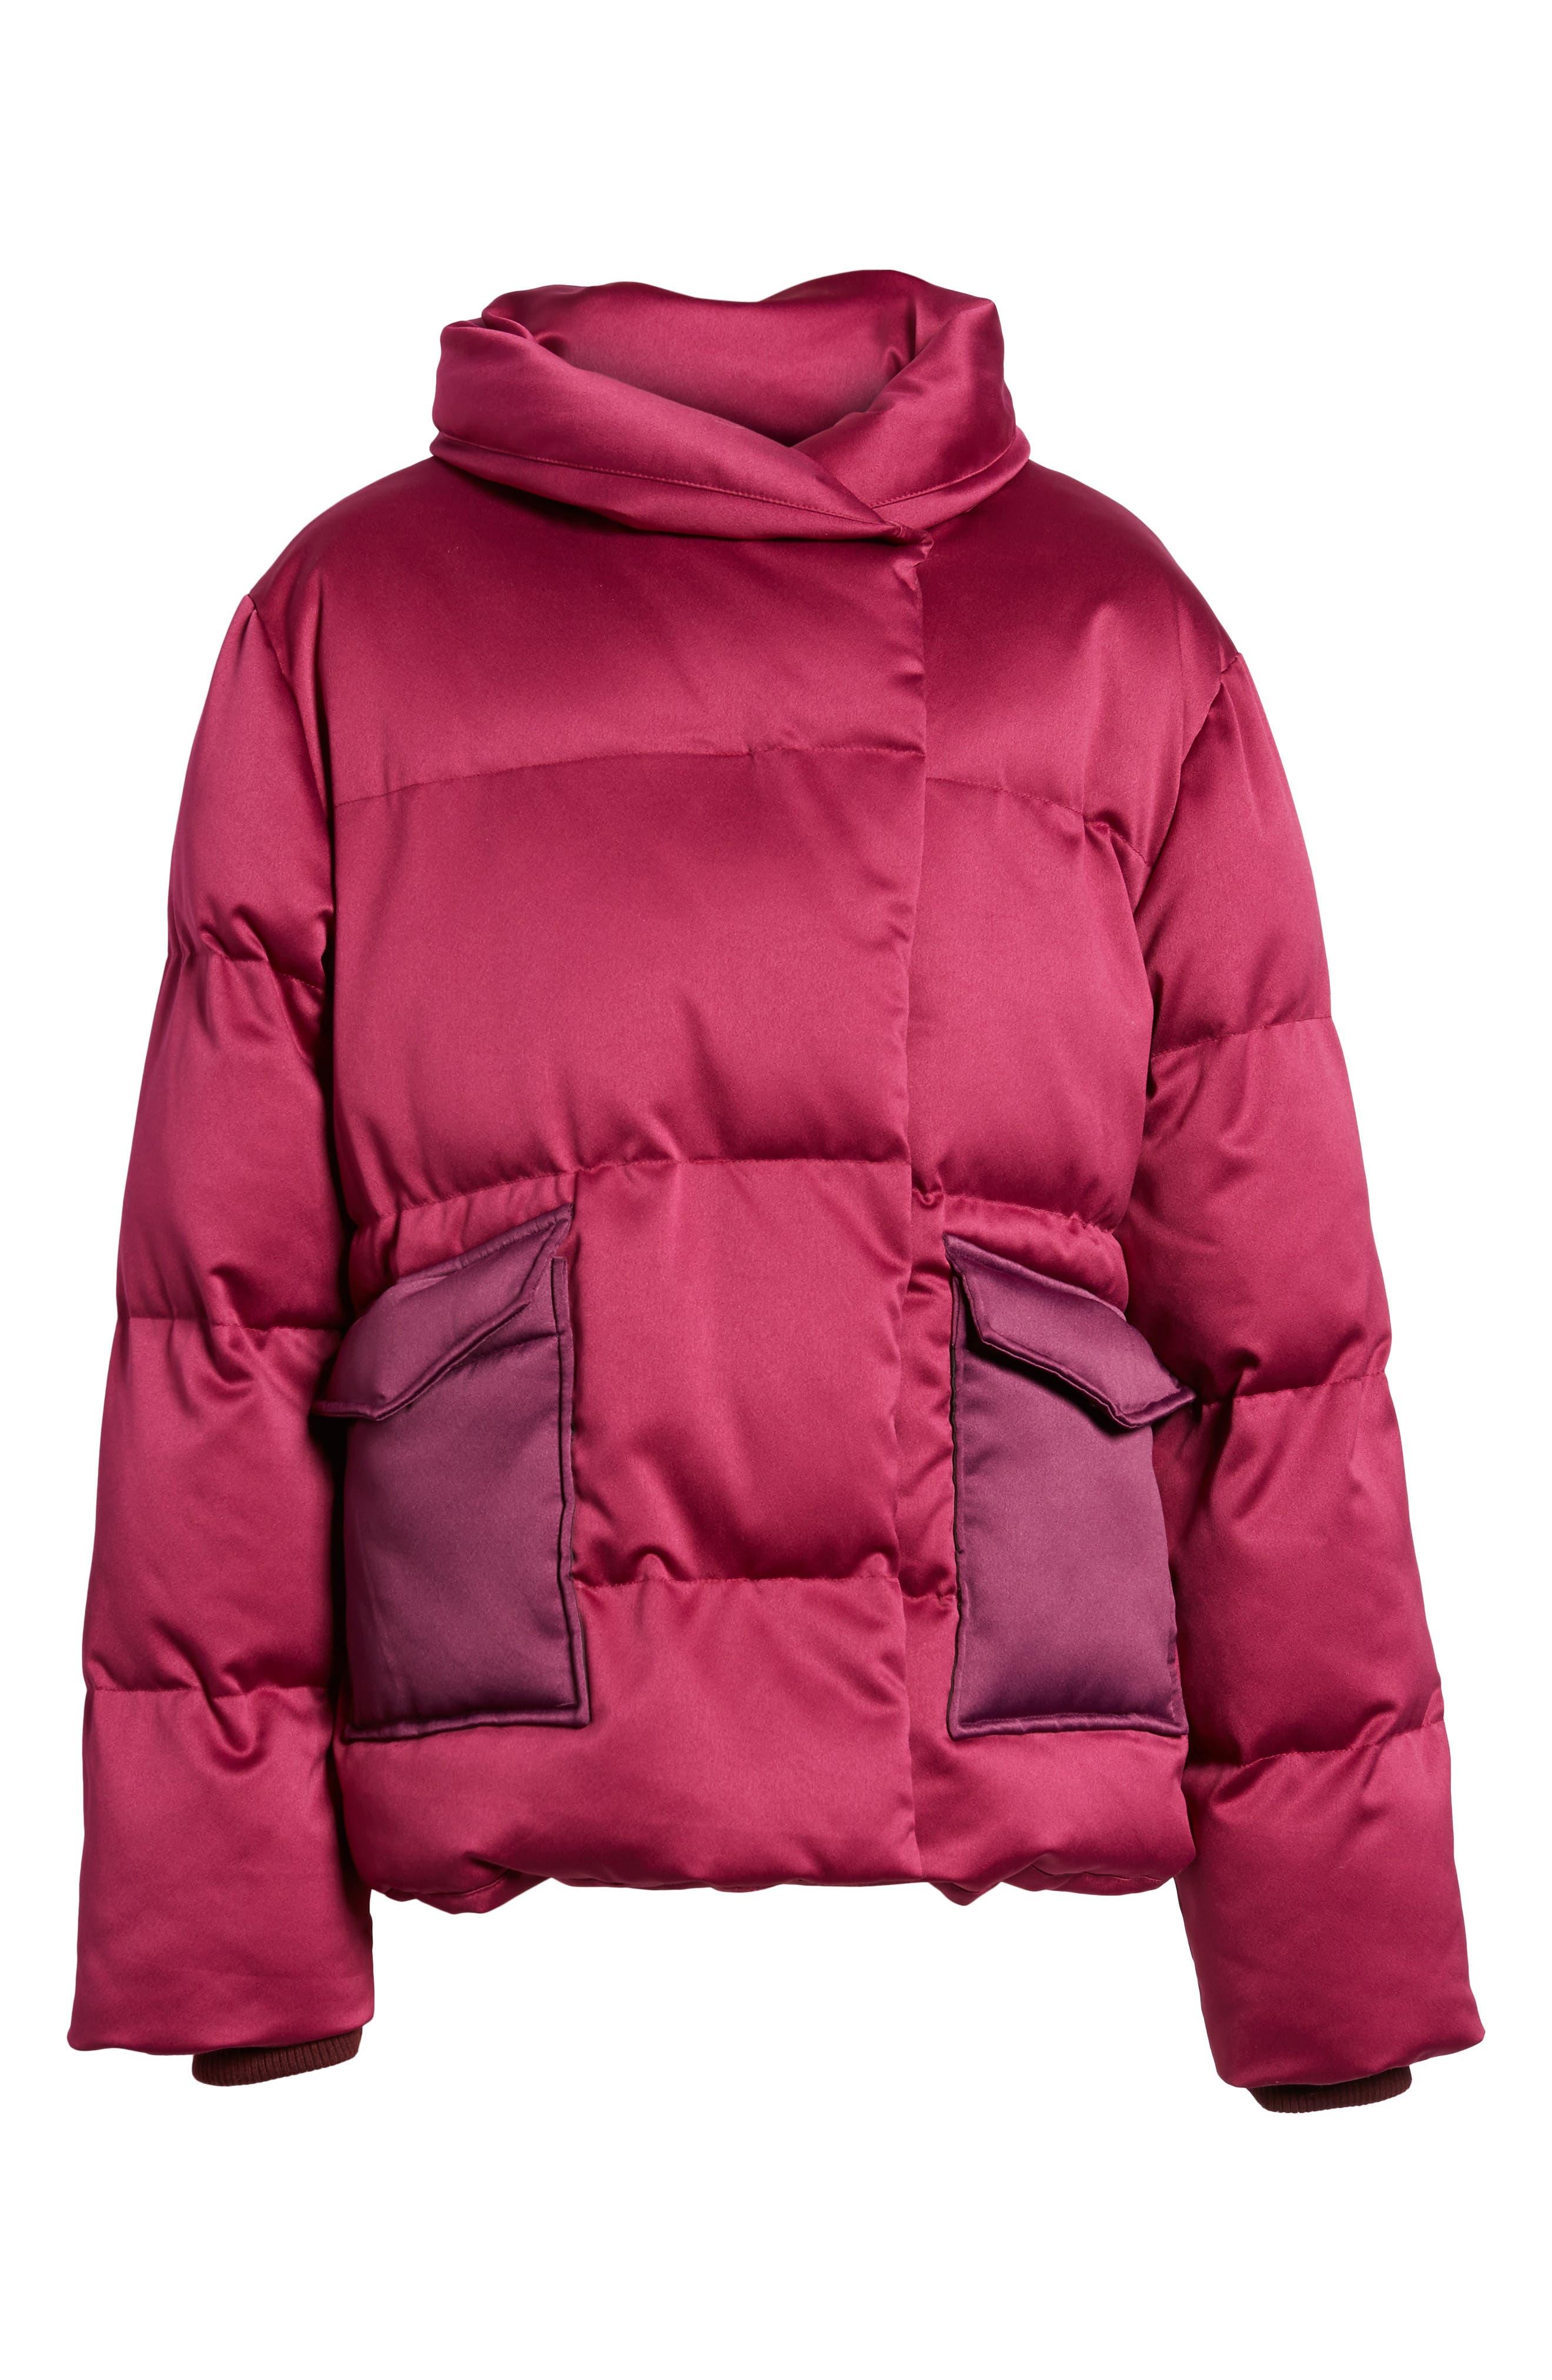 Satin Puffer Jacket,                             Alternate thumbnail 6, color,                             Bright Pink